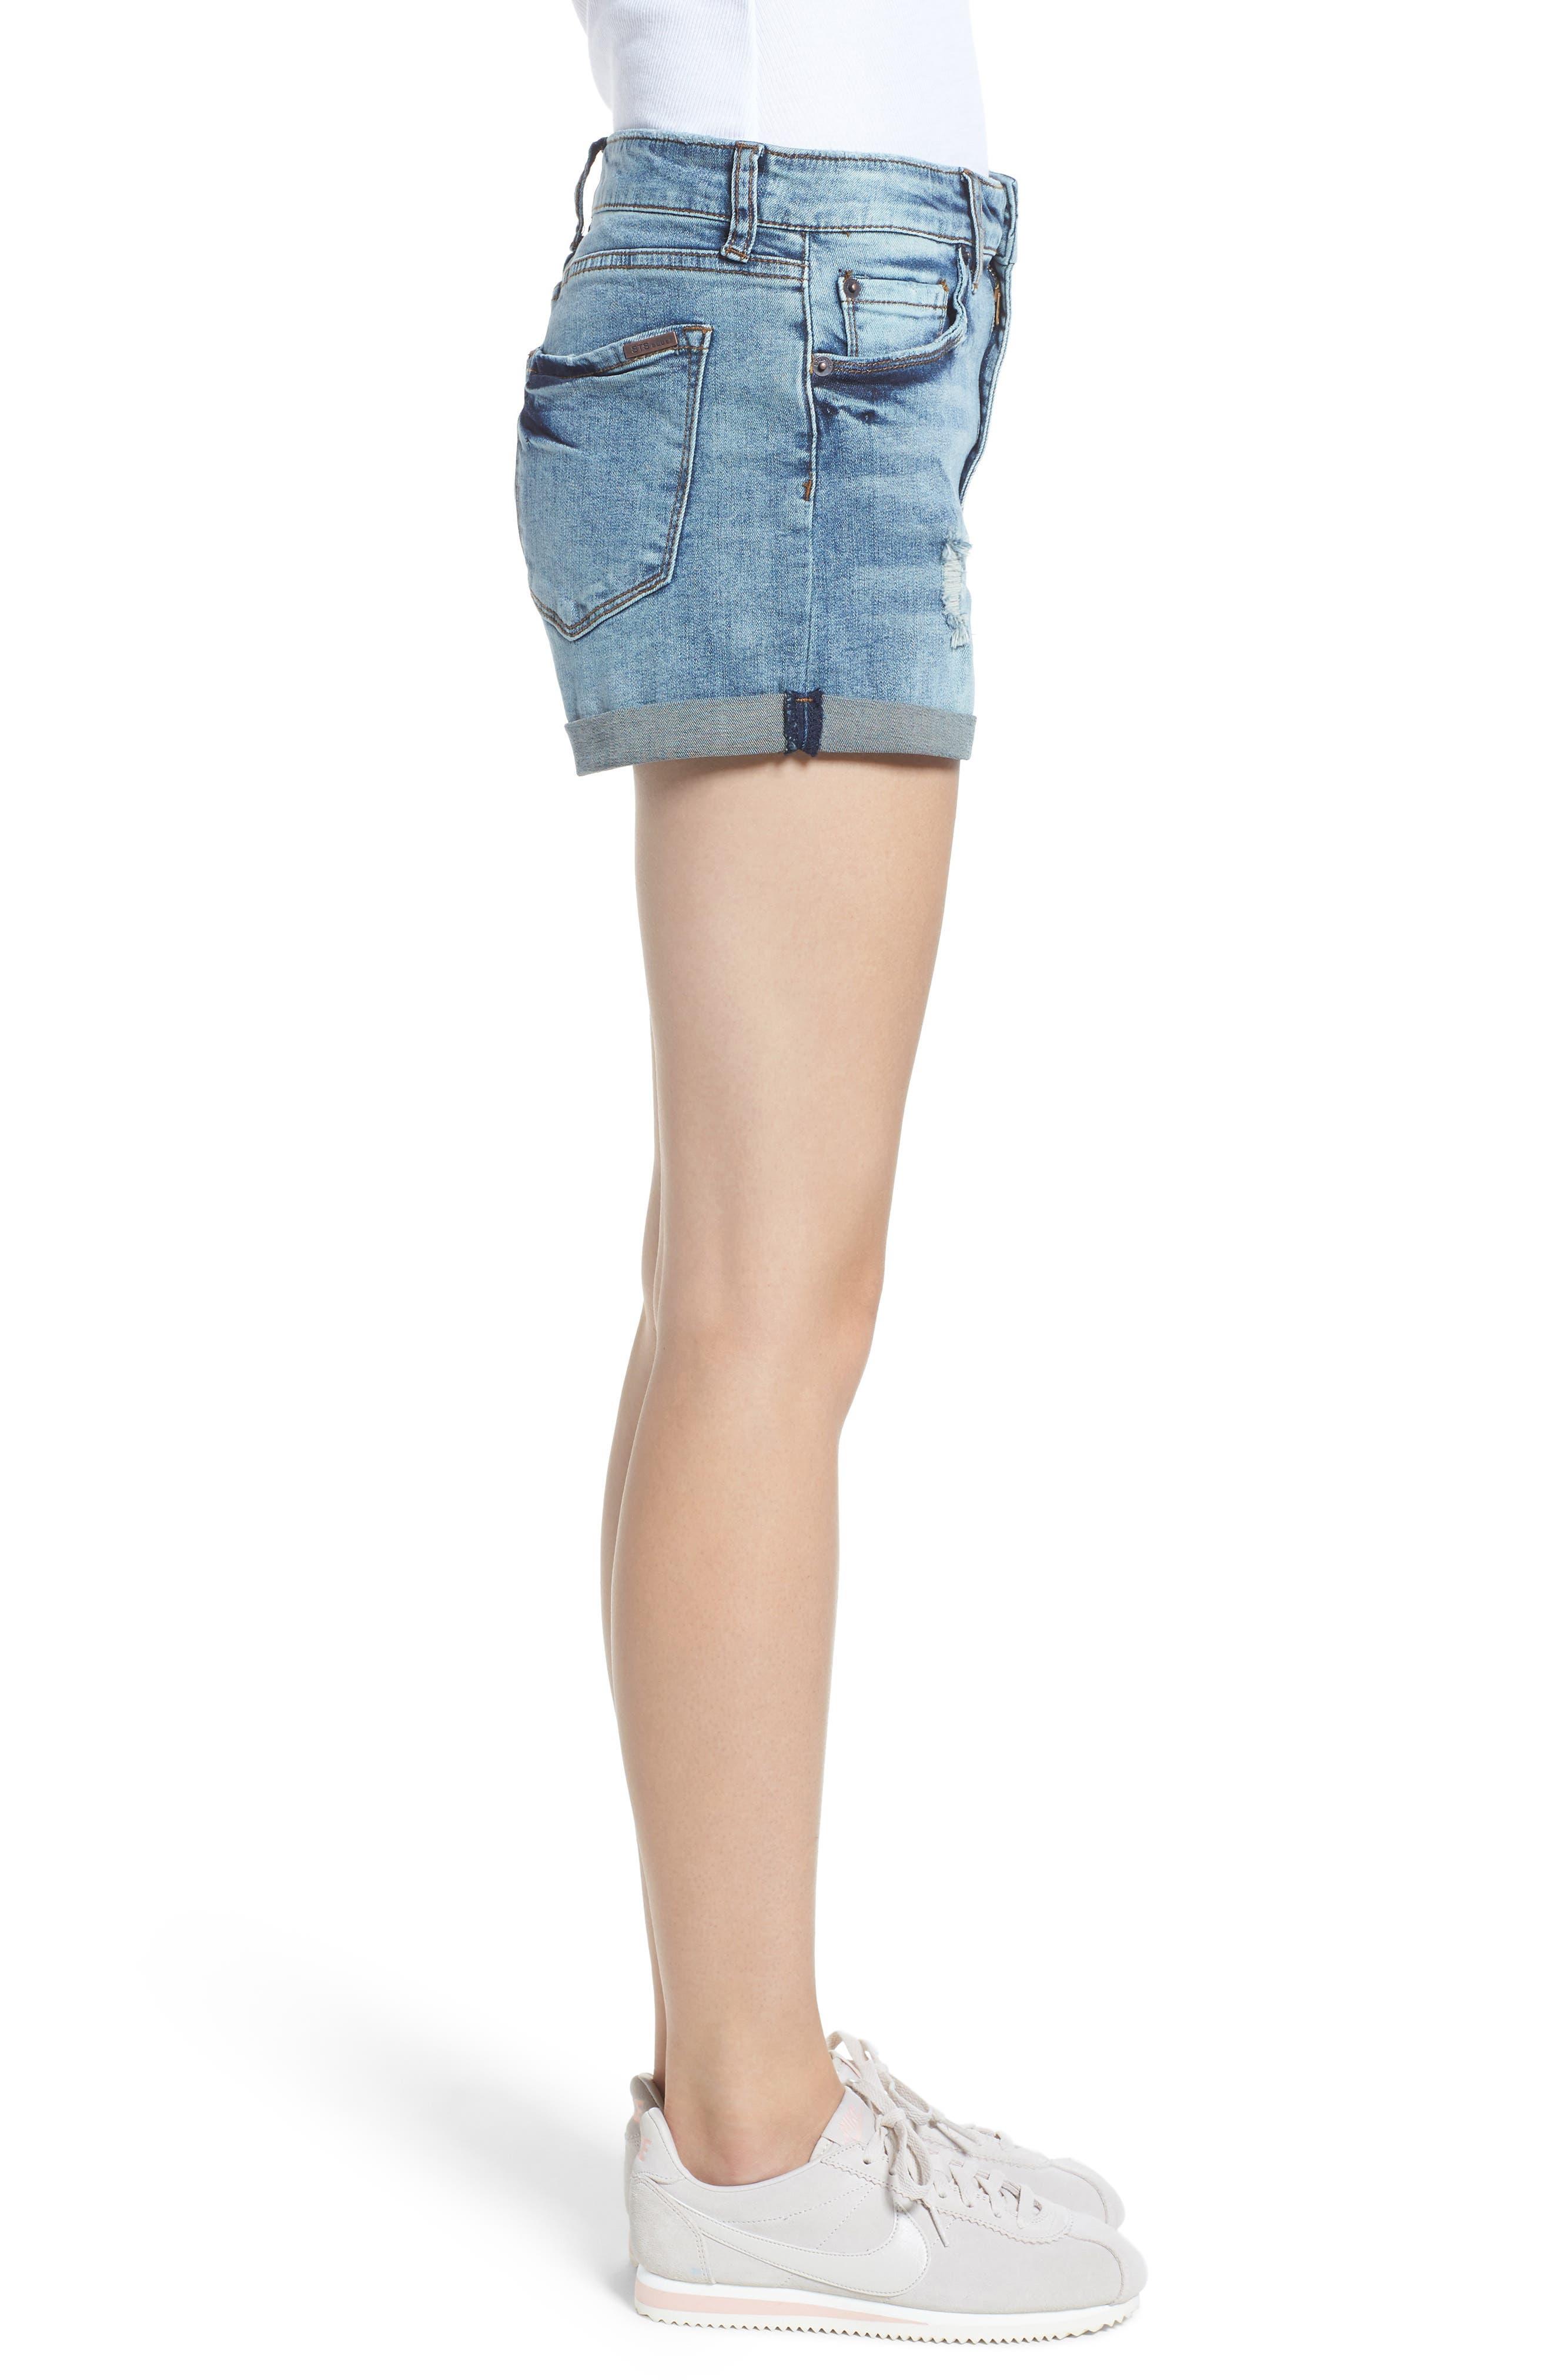 STS Blue Distressed High Waist Denim Shorts,                             Alternate thumbnail 3, color,                             Rivindel W/ Lt Base